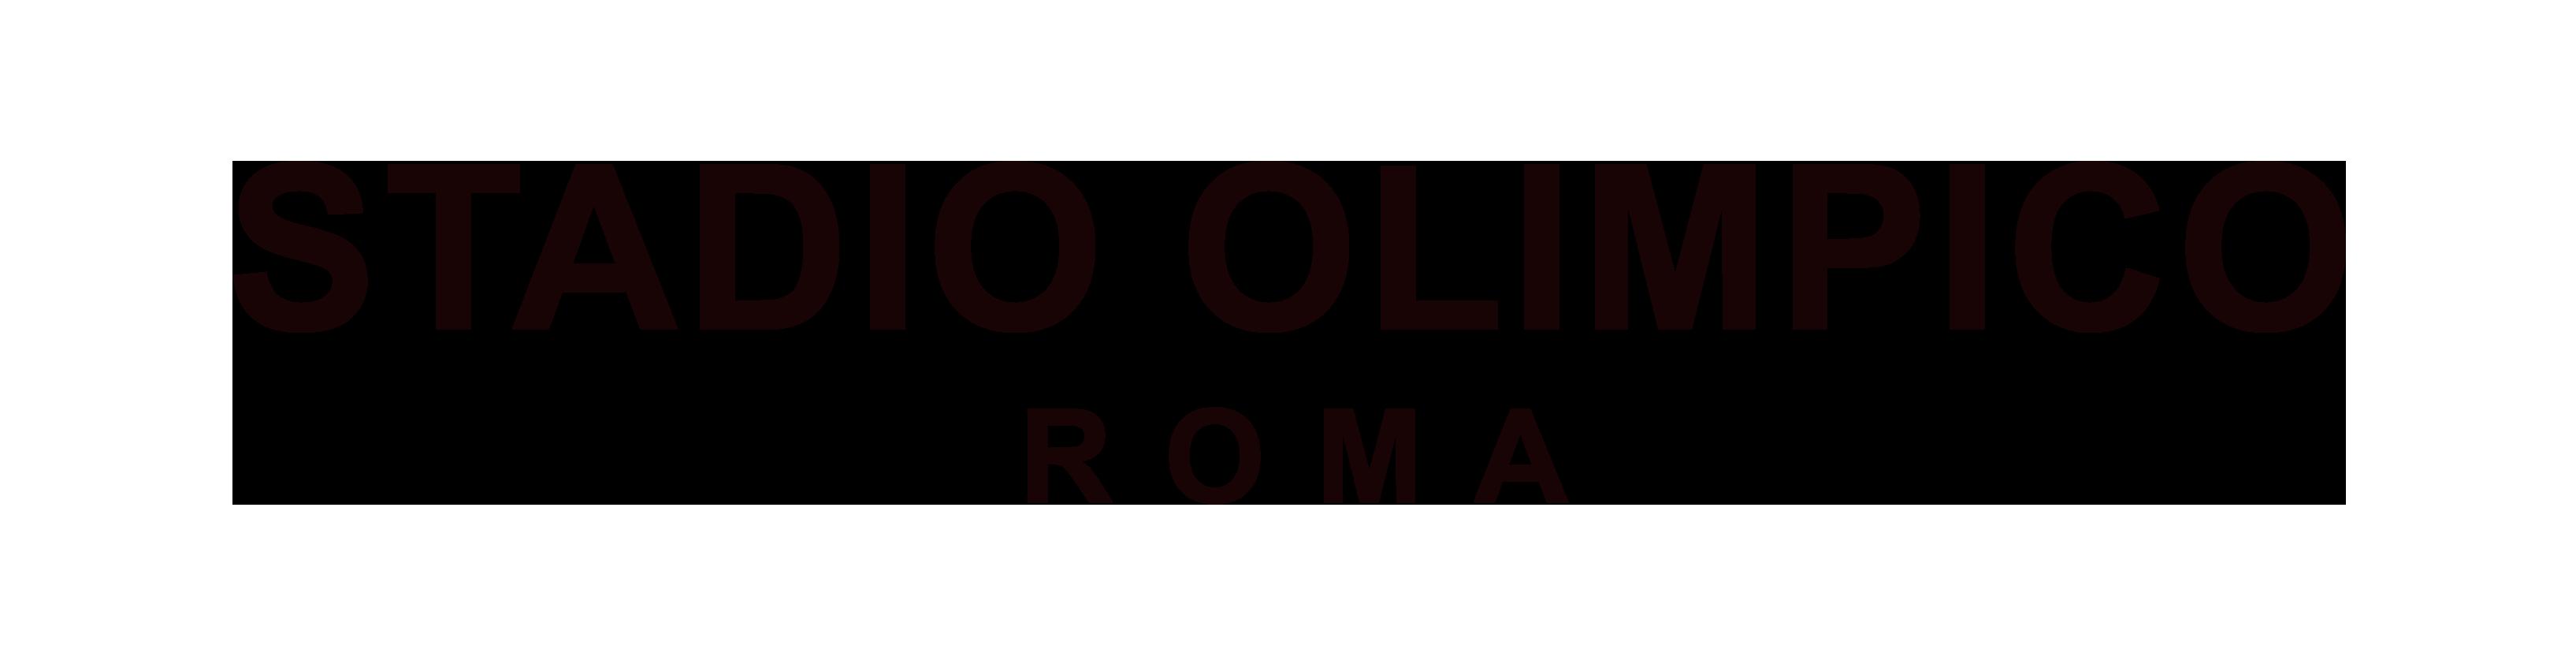 stadio olimpico roma.png